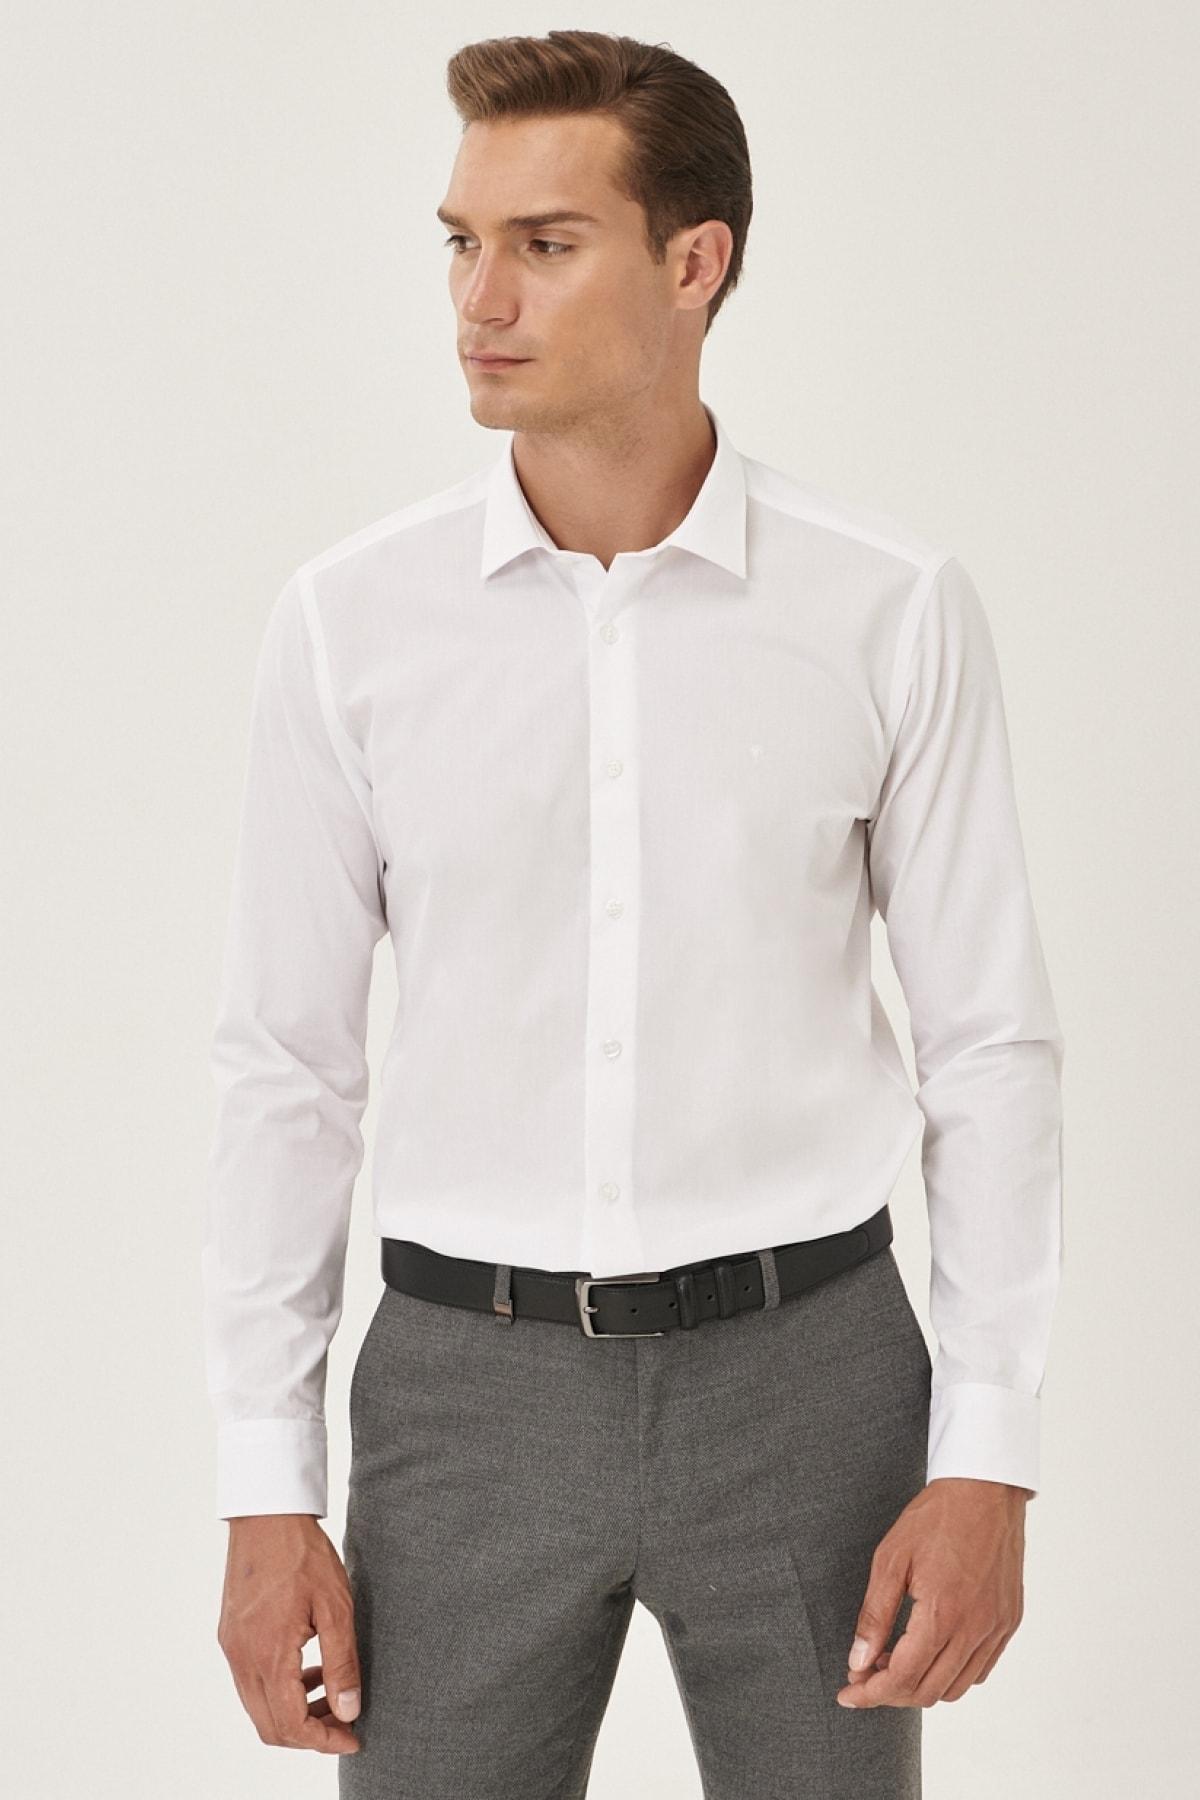 Erkek Beyaz Tailored Slim Fit Klasik Yaka Gömlek